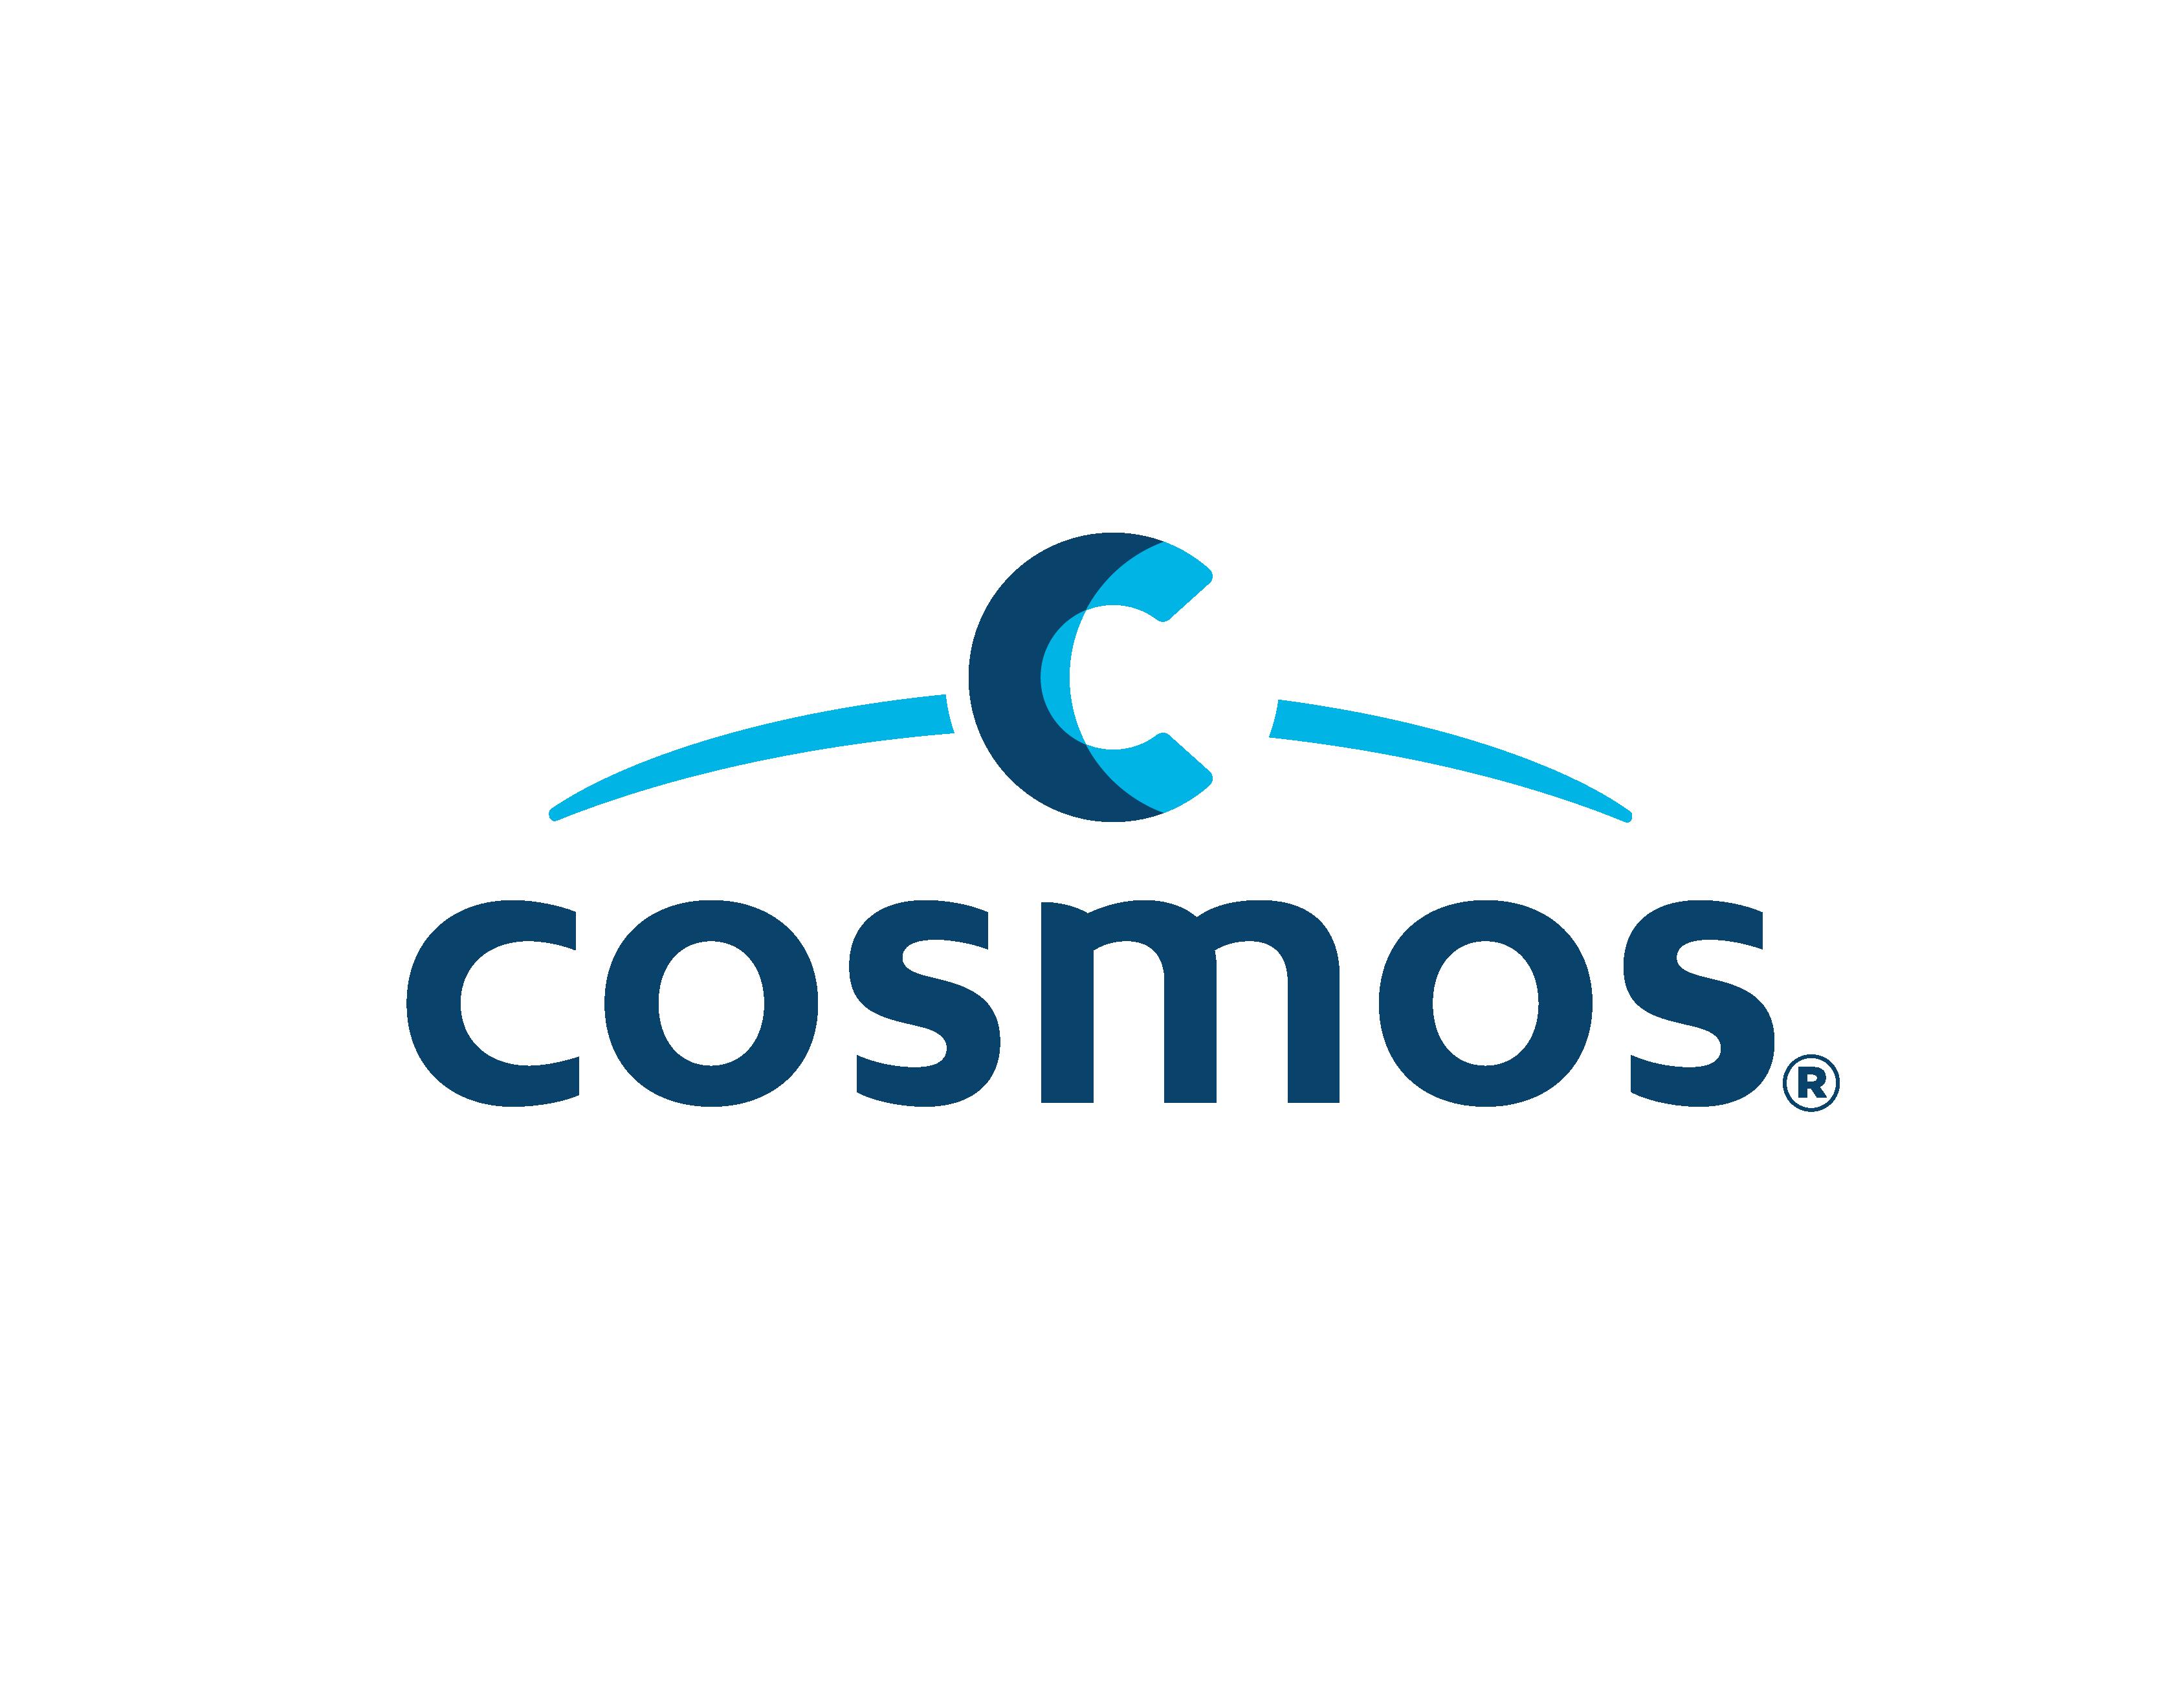 Cosmos Corporation logo